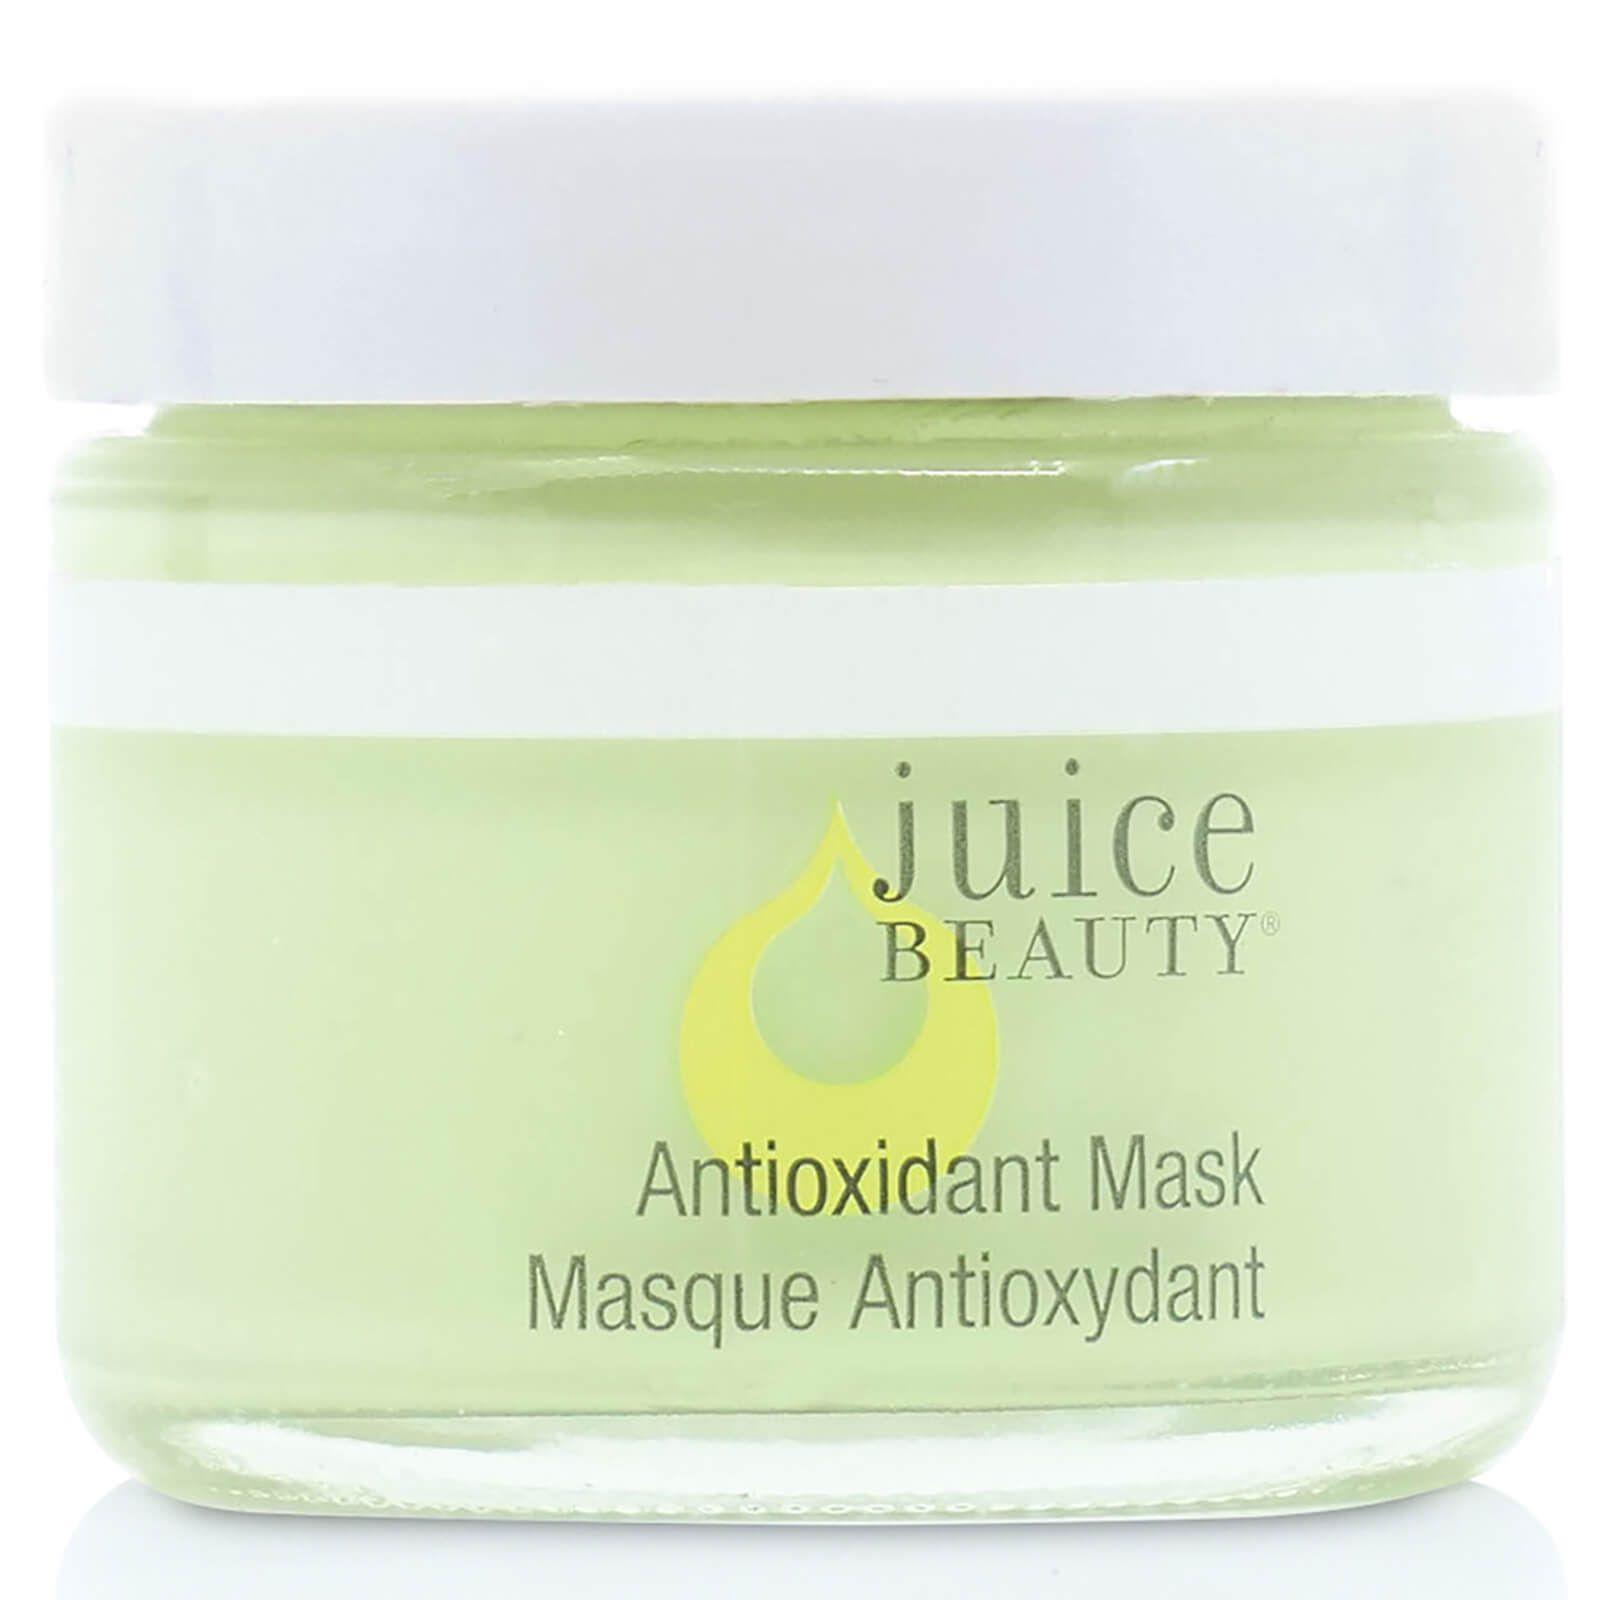 antioxidant mask in a jar, it's green